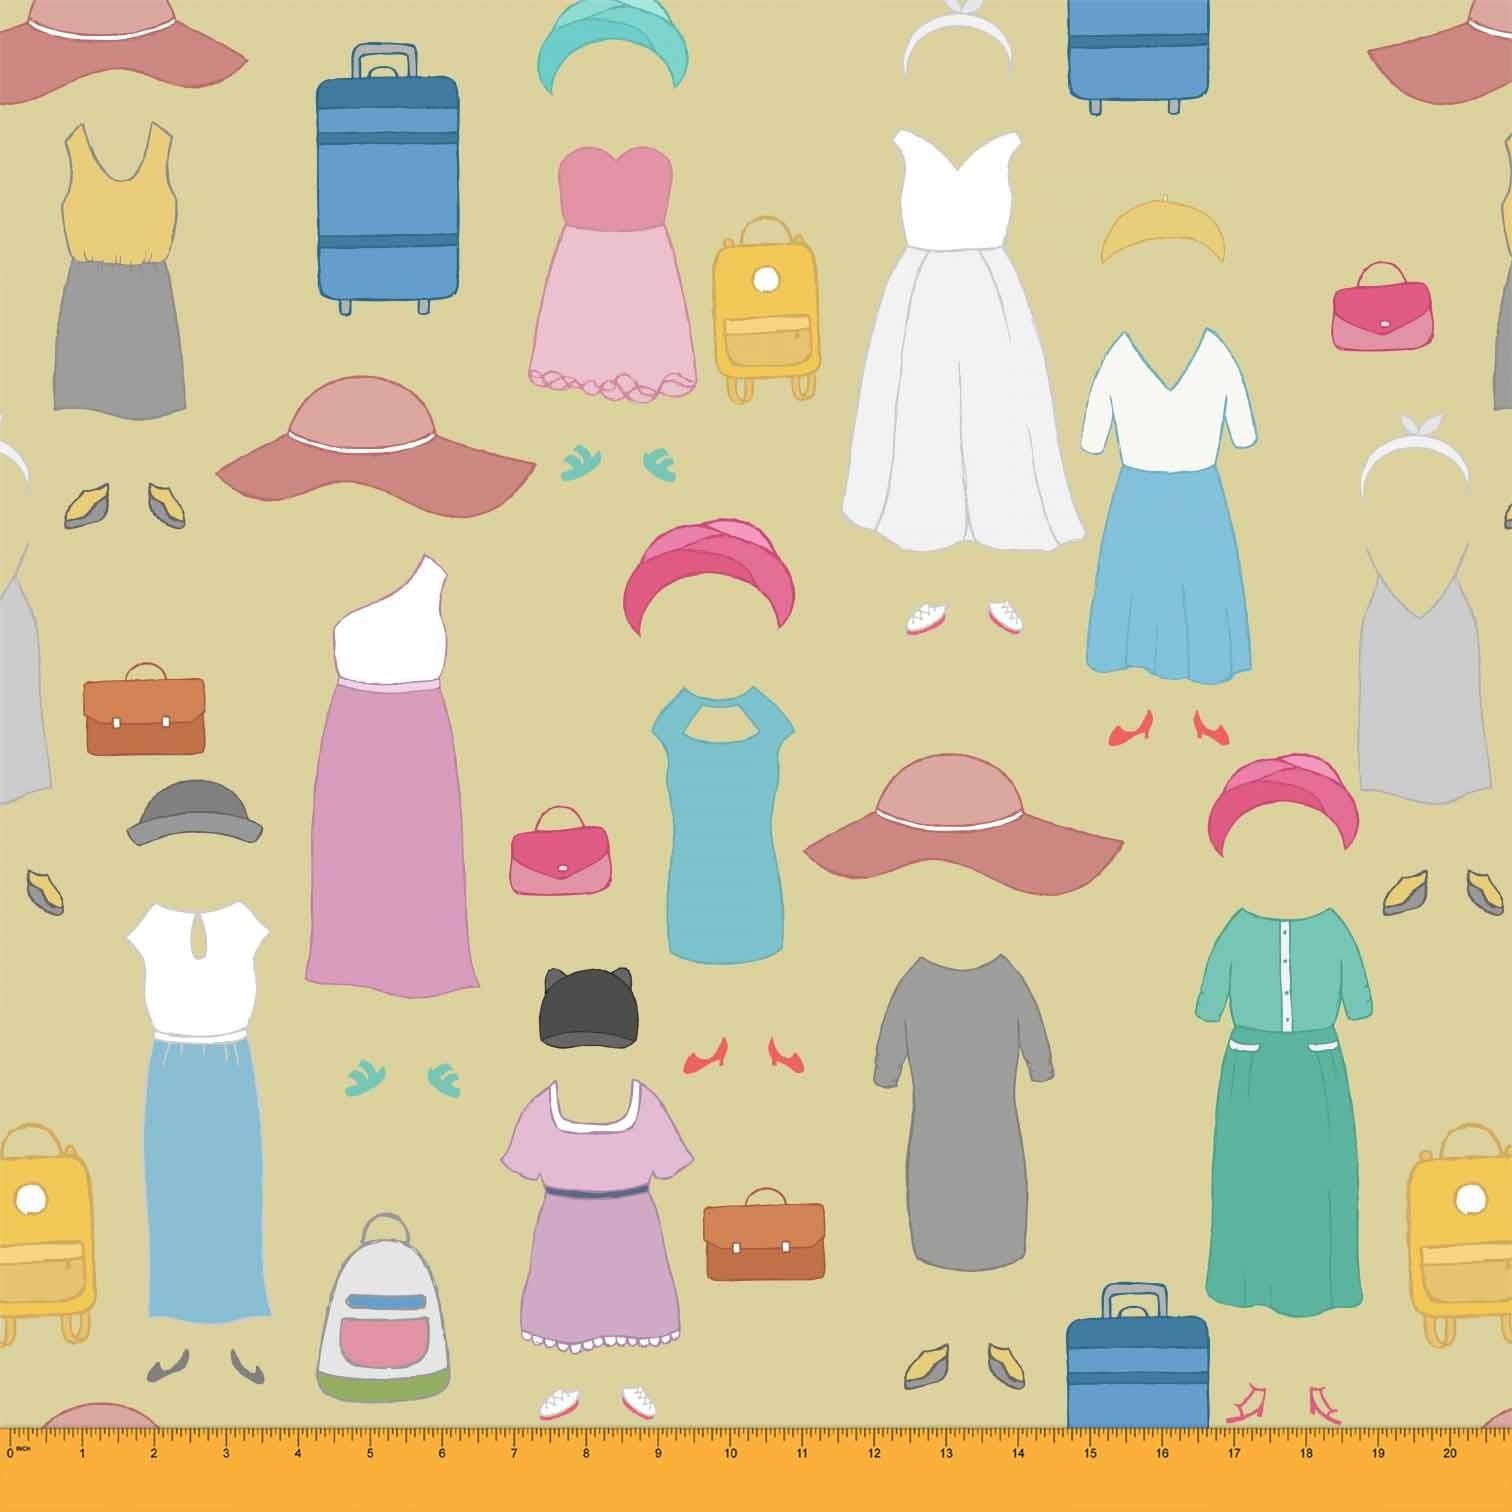 Soimoi Dresses & Luggage Bag Women Fabric Prints By Yard.